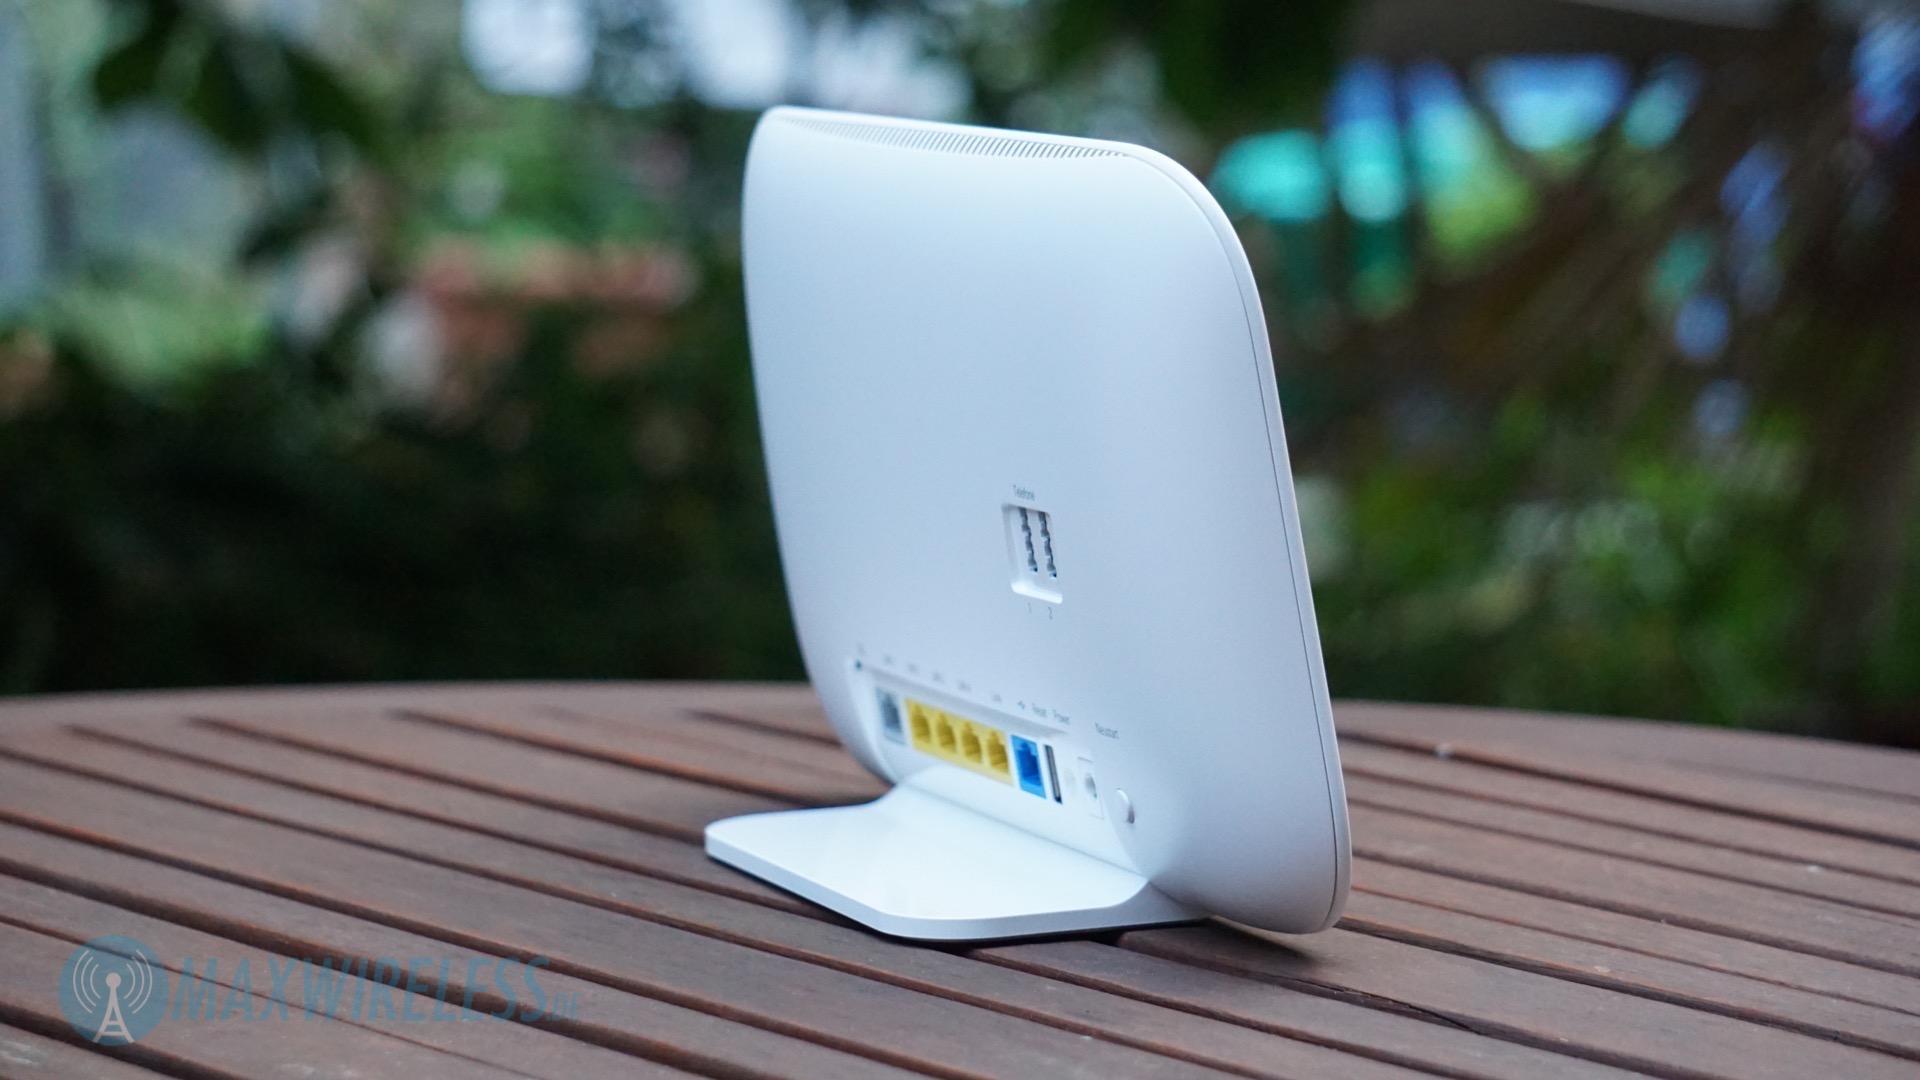 erster eindruck telekom speedport smart. Black Bedroom Furniture Sets. Home Design Ideas